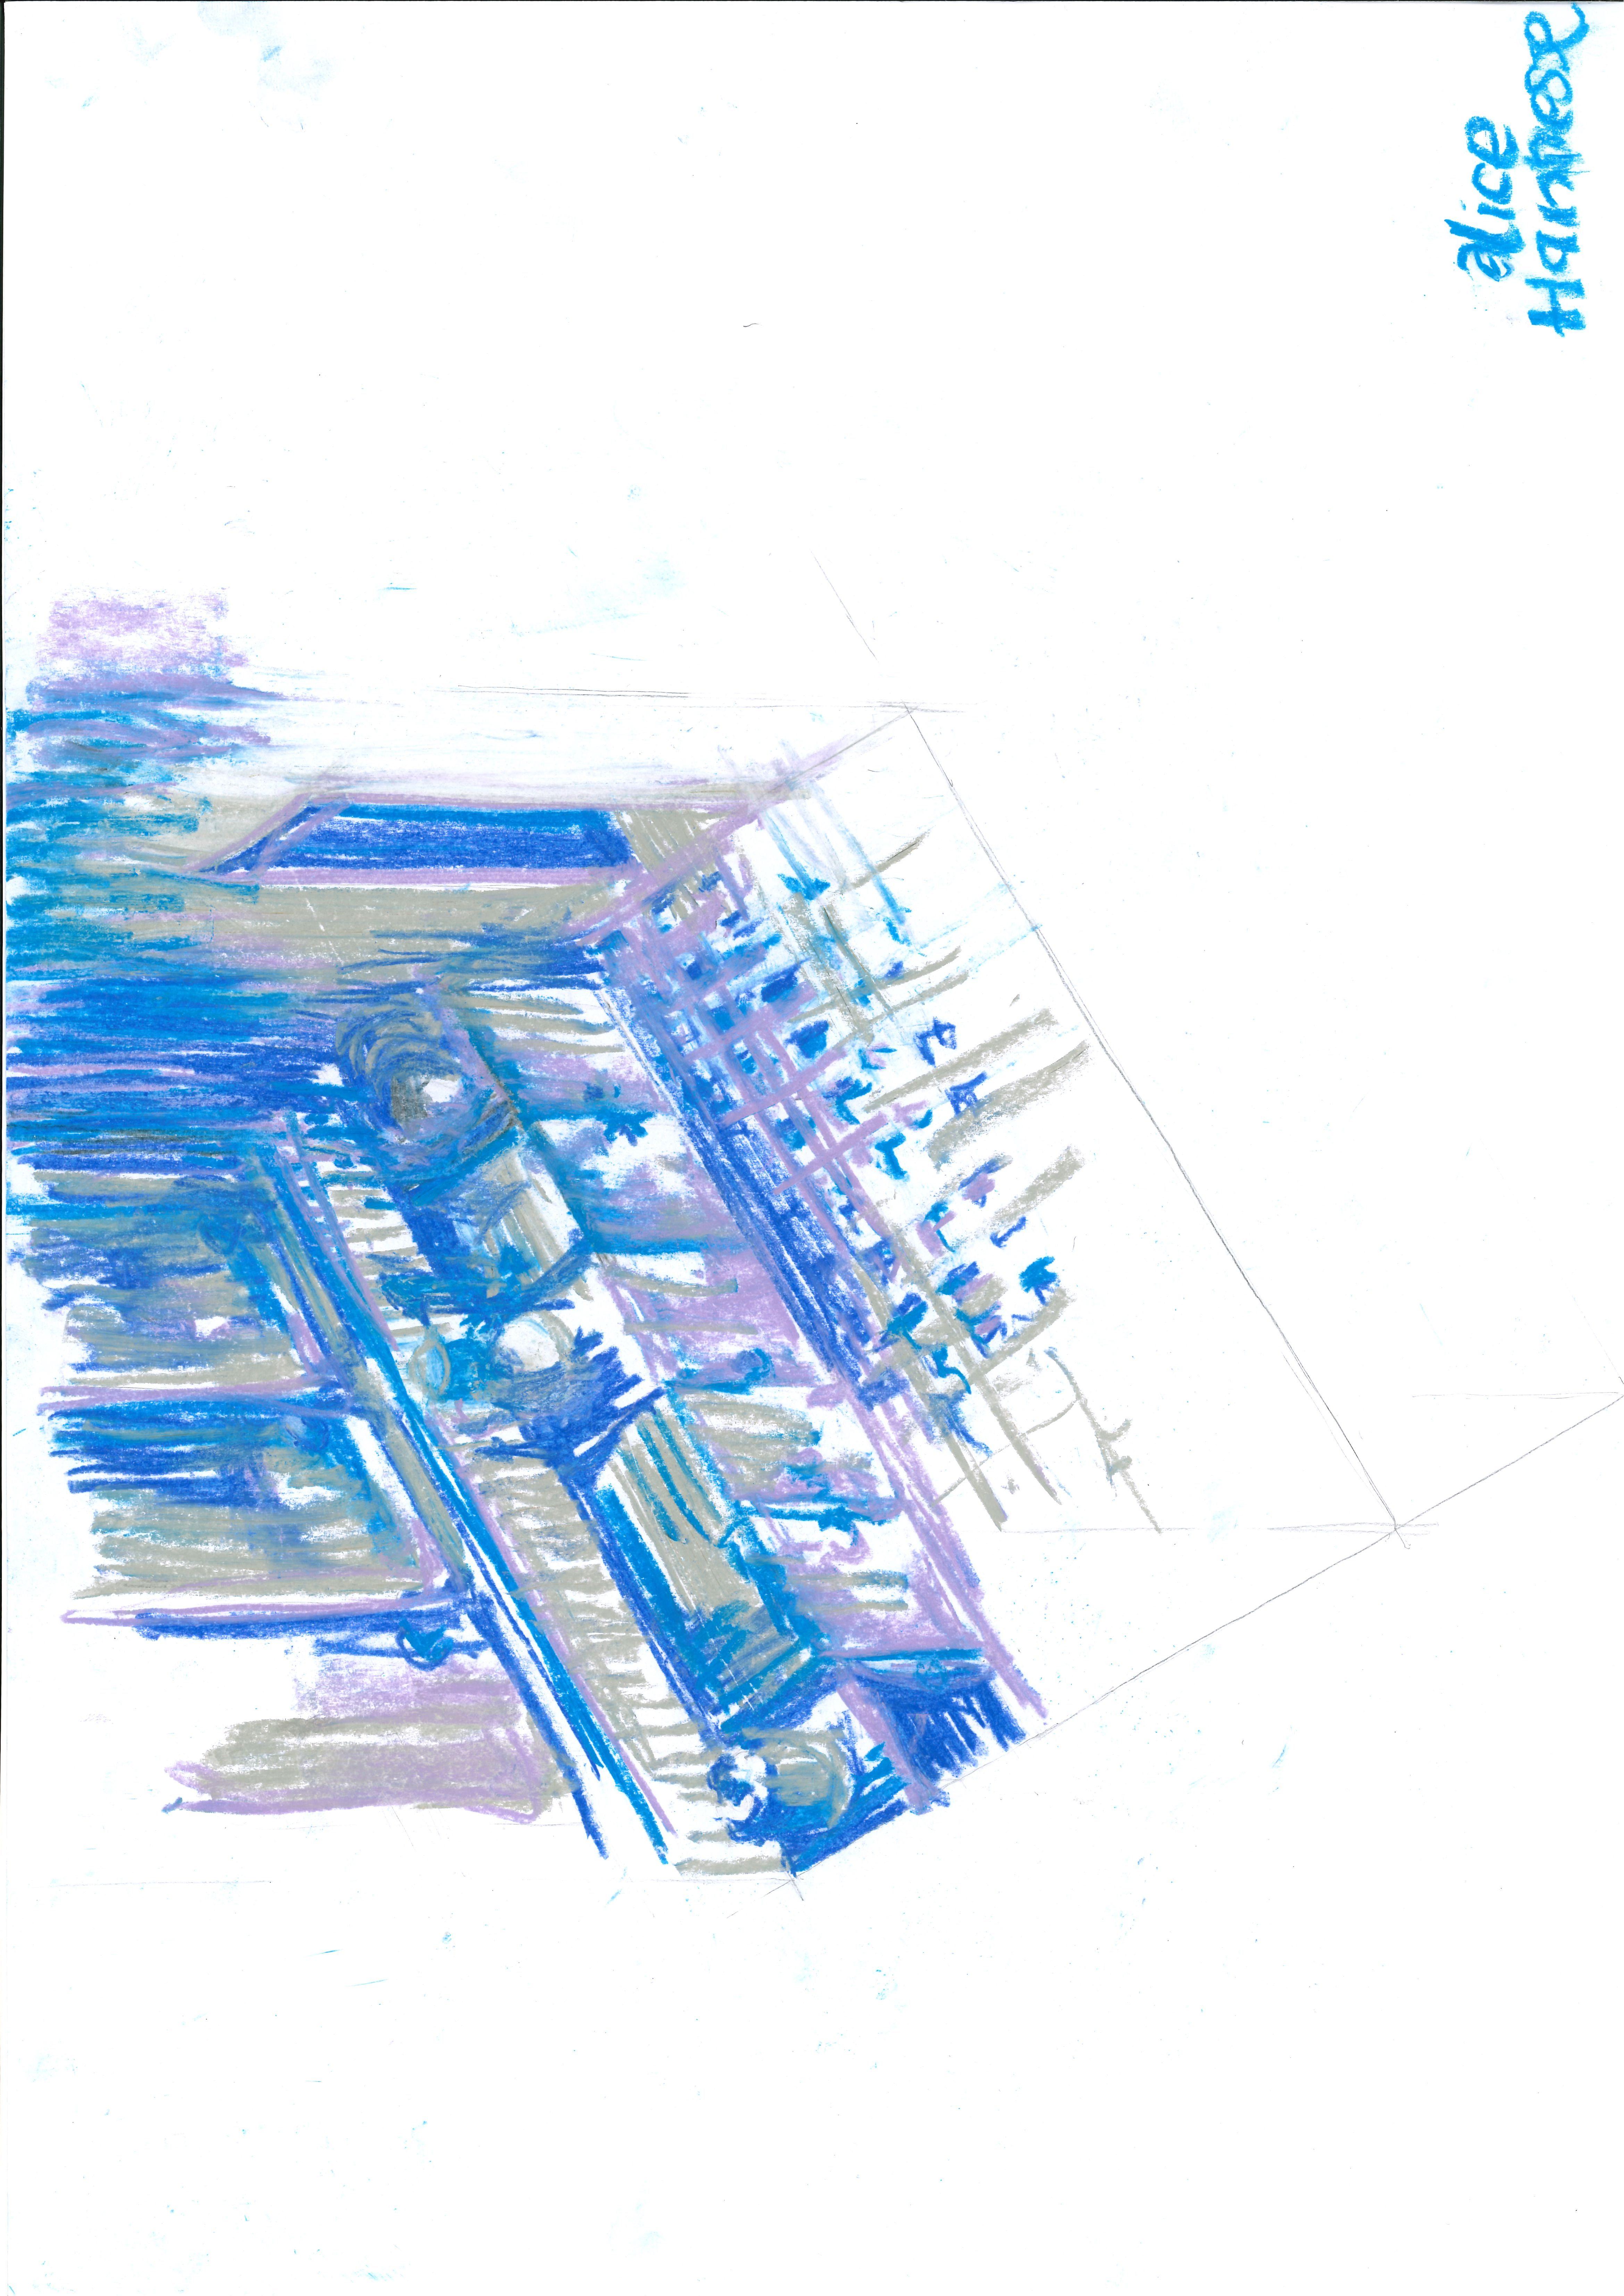 BUCHAREST-lab-ARRET SUR IMAGE 190222-sierranevada-21fev-a3__Page_13